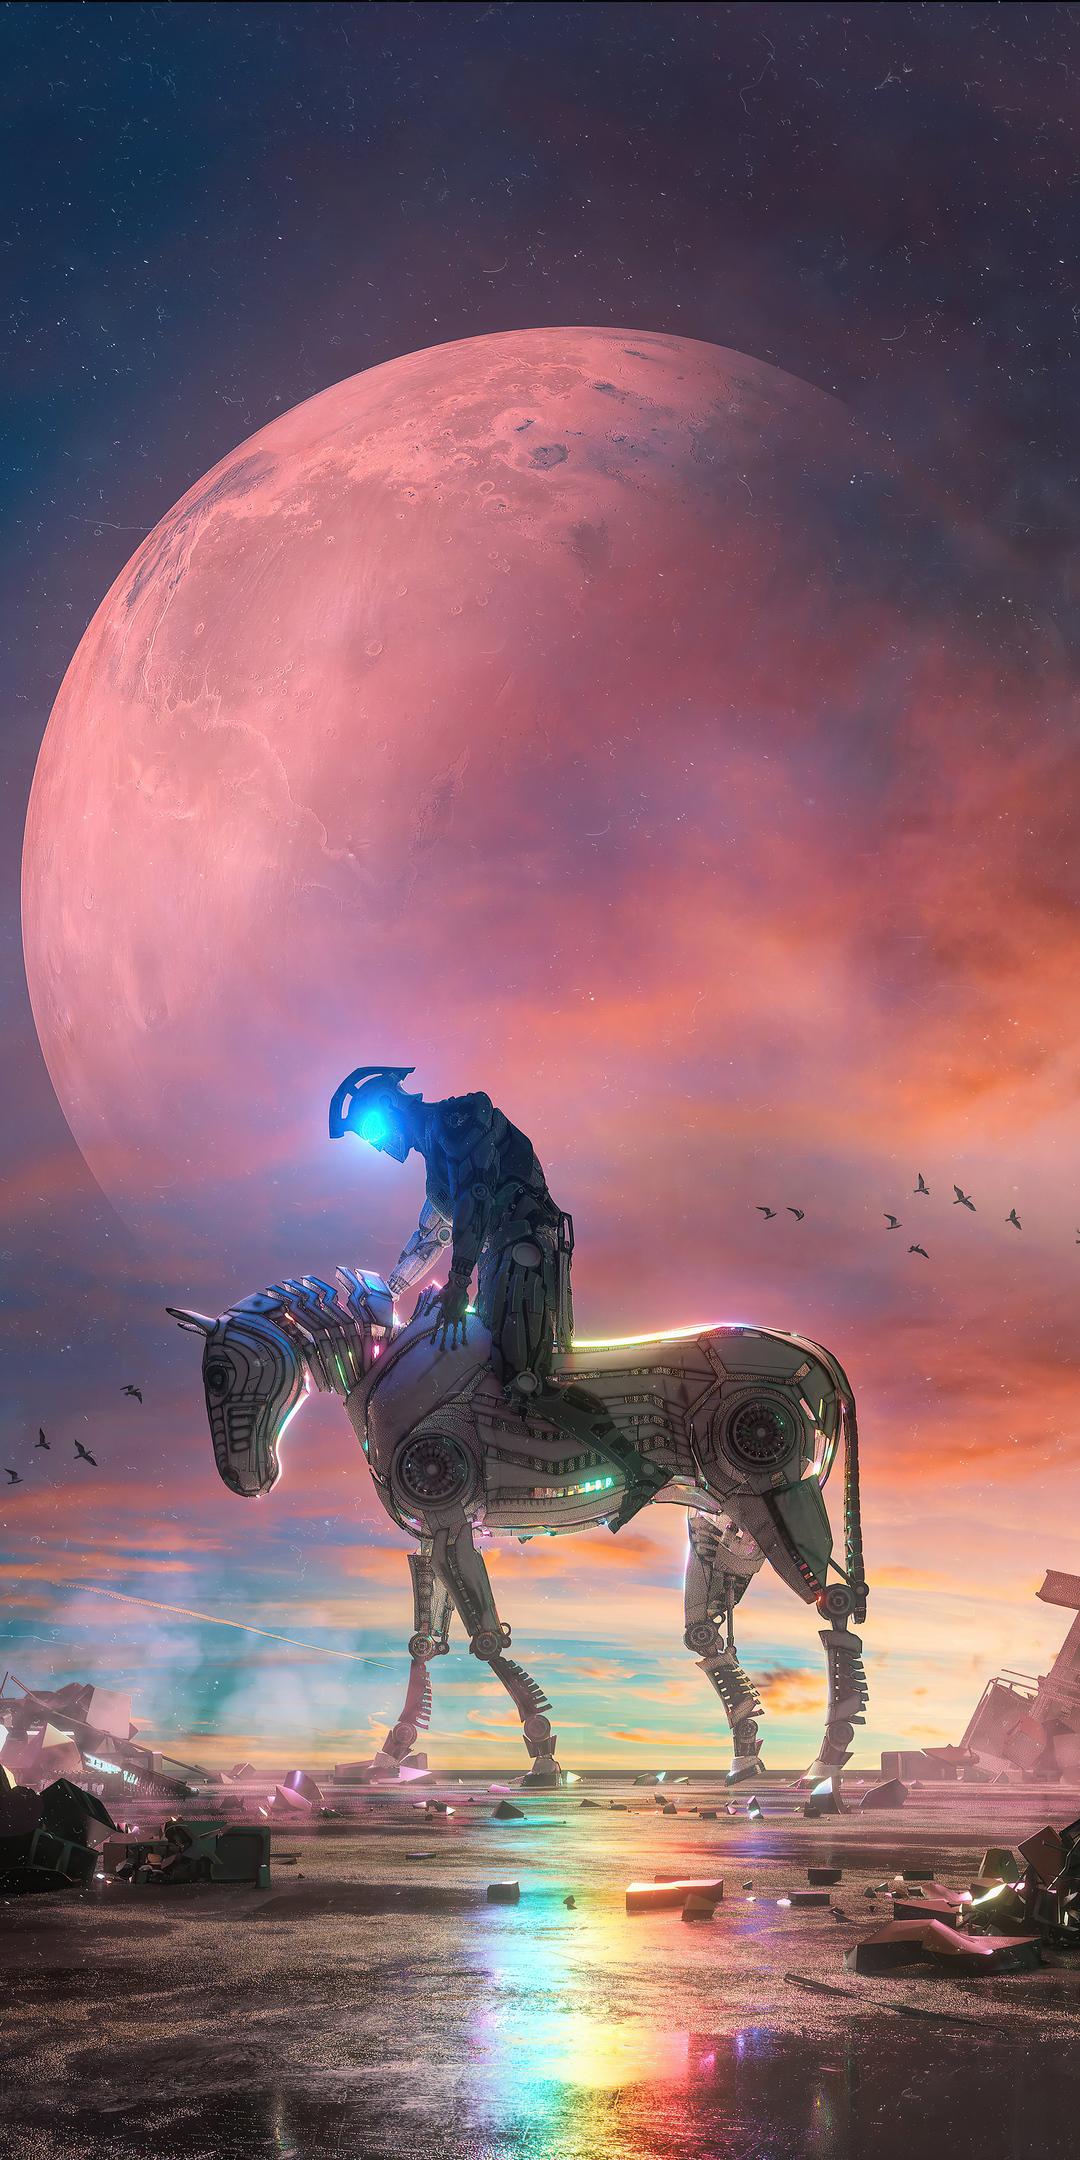 cyborg-horse-rider-5k-4a.jpg